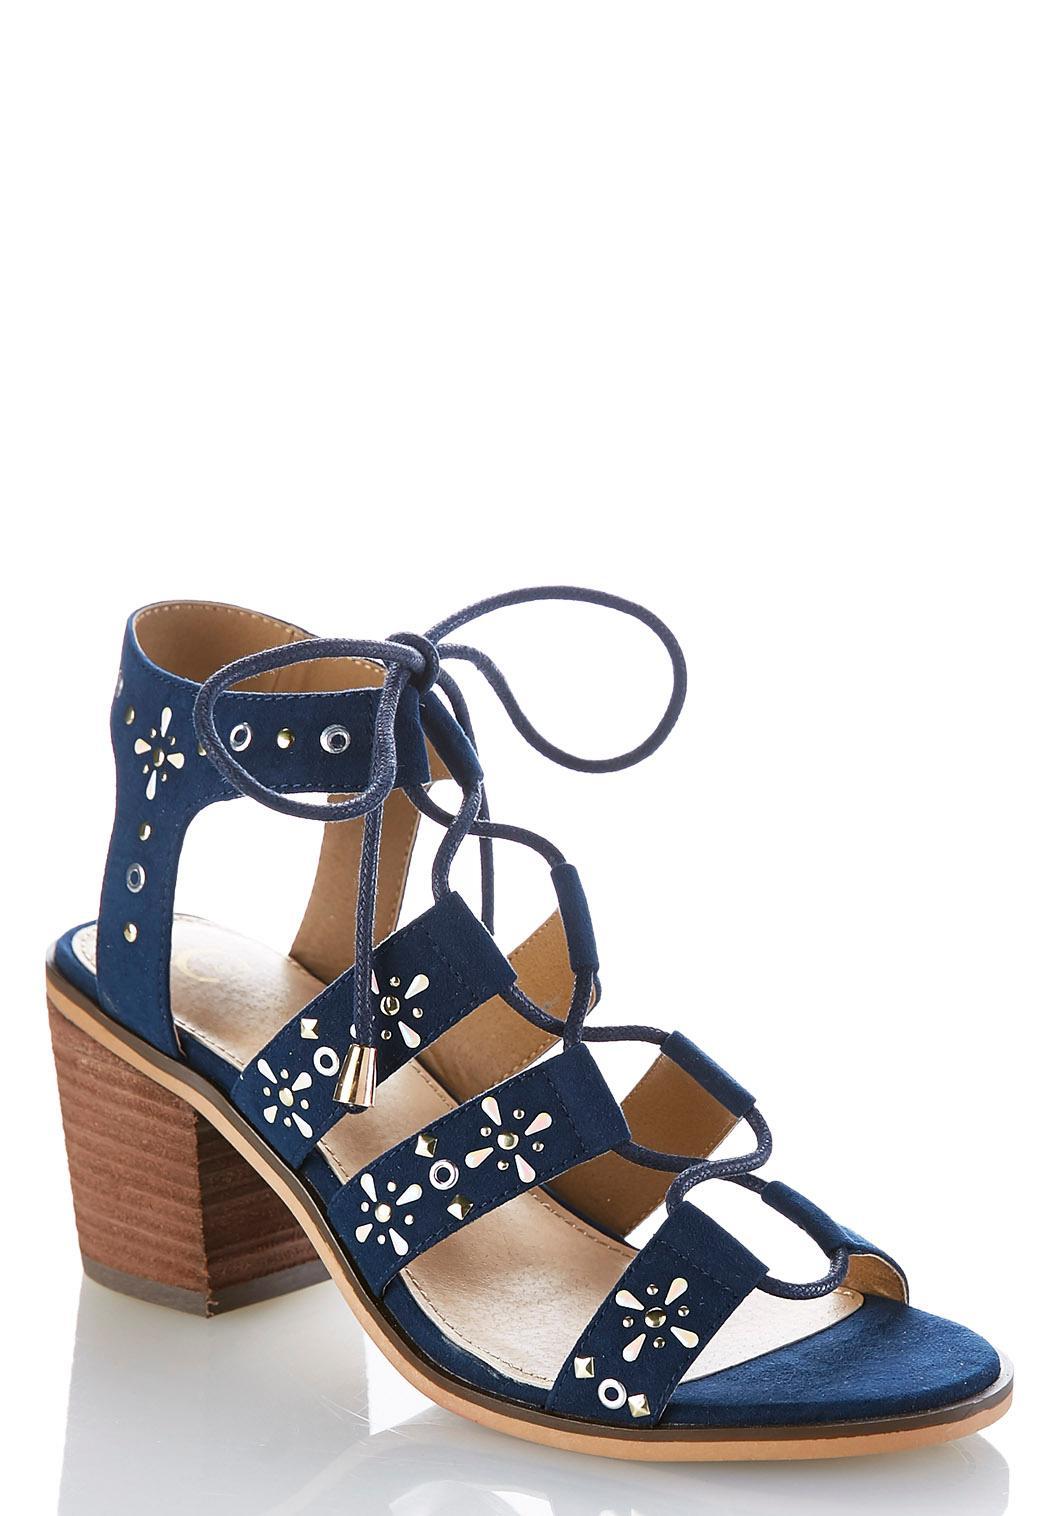 Lace Up Gladiator Heeled Sandals